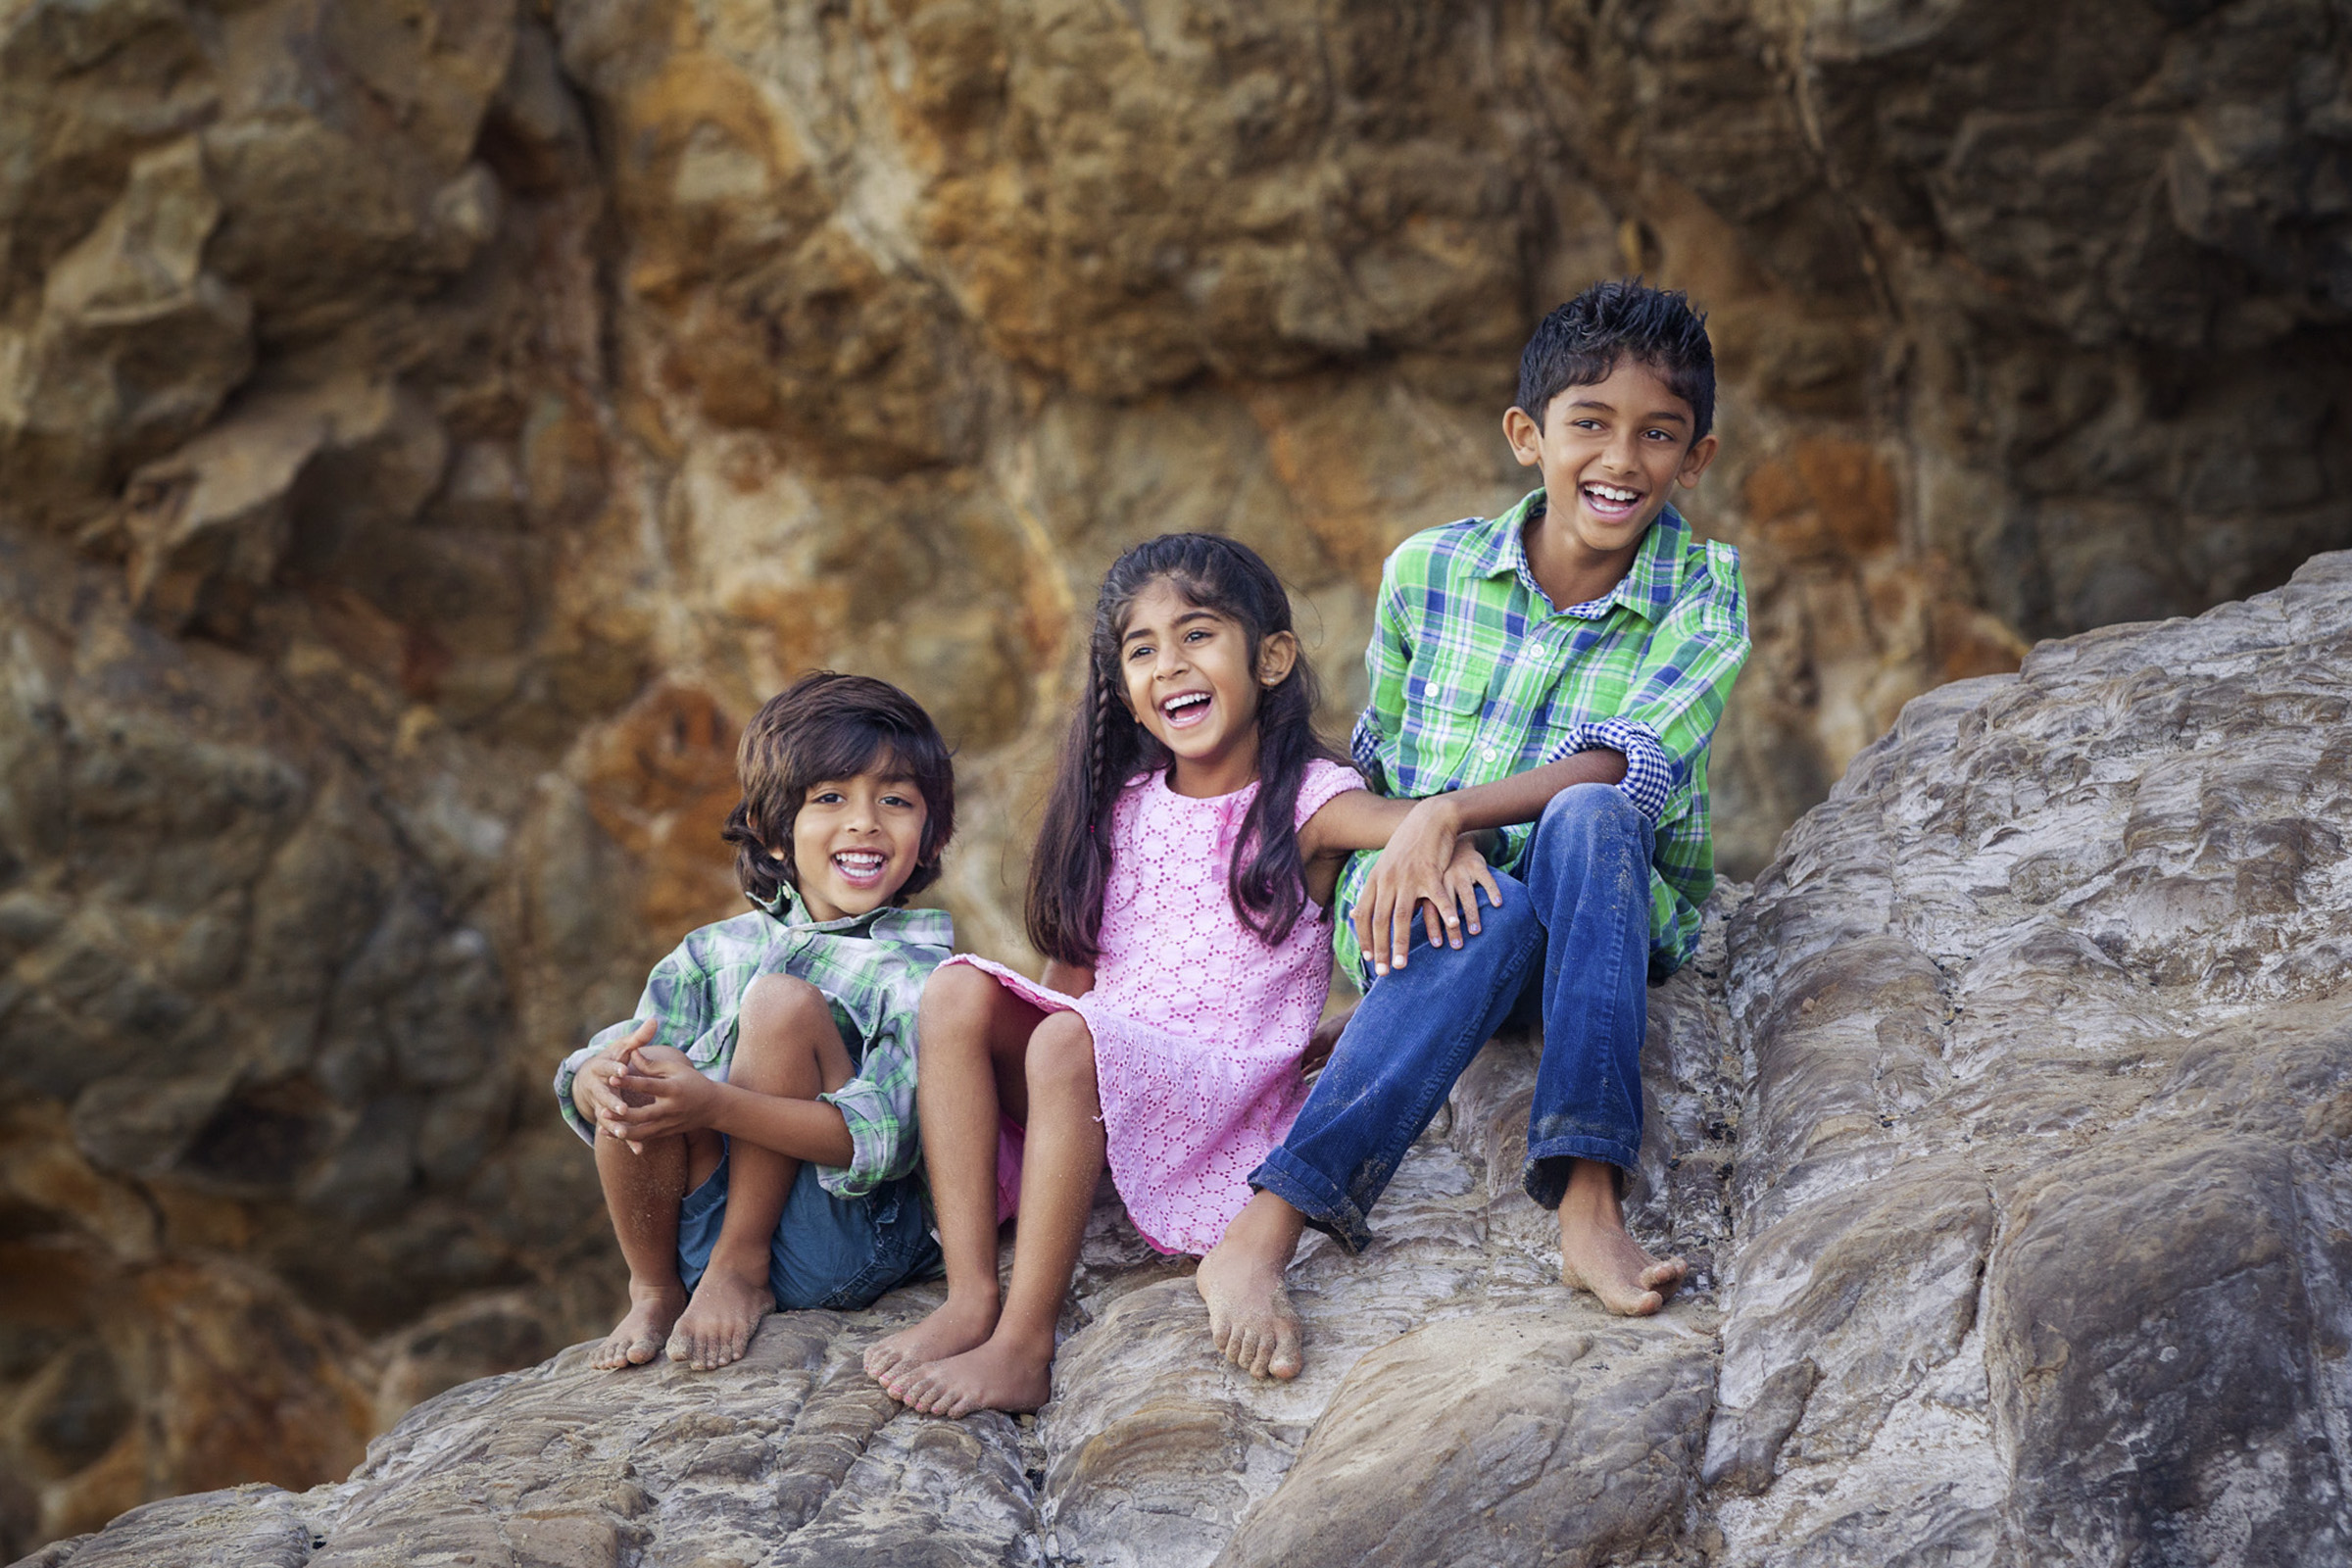 Children-27.jpg